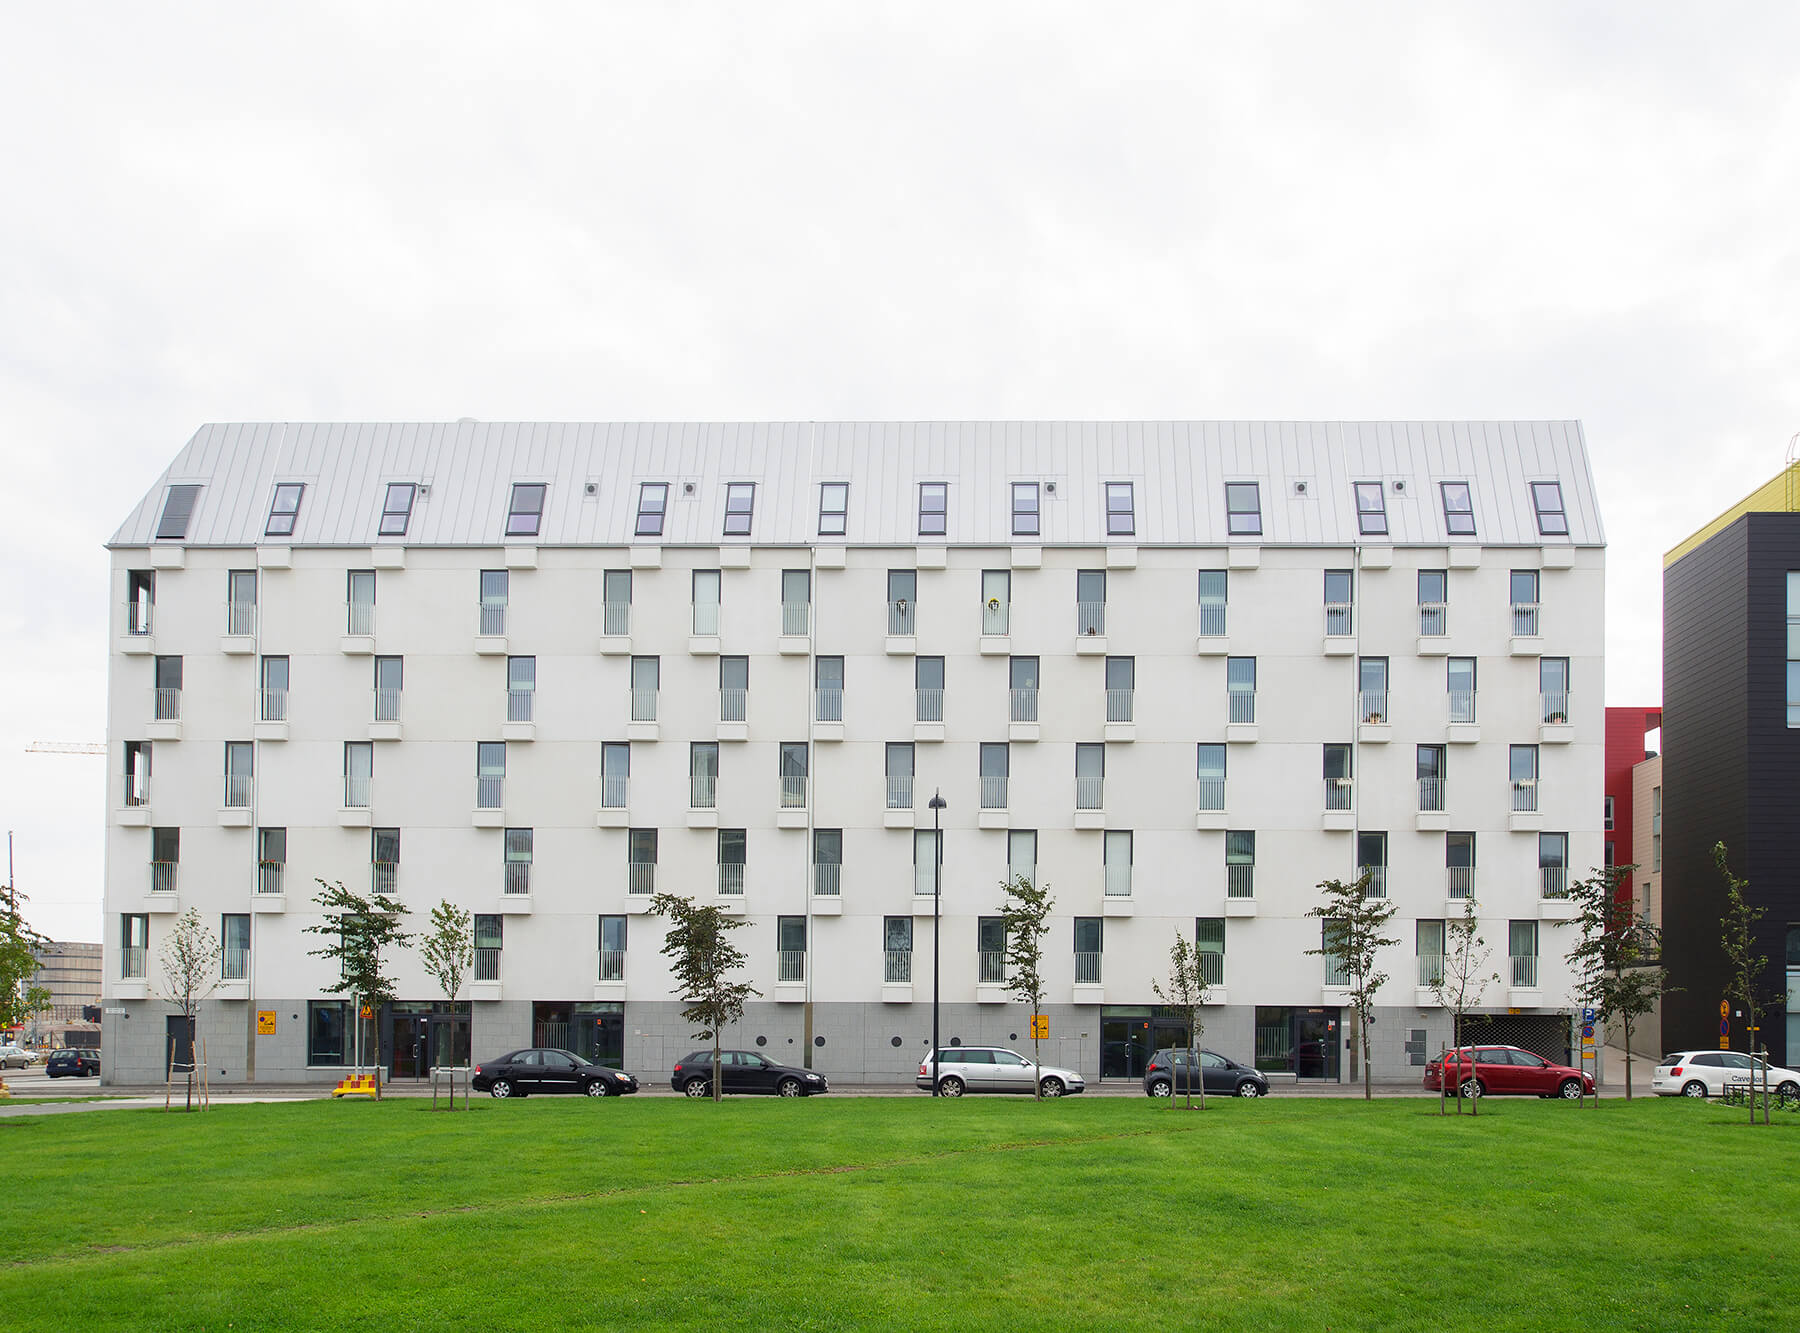 lansisatamankatu-residential-building-graphic-concrete-005-1800px.jpg